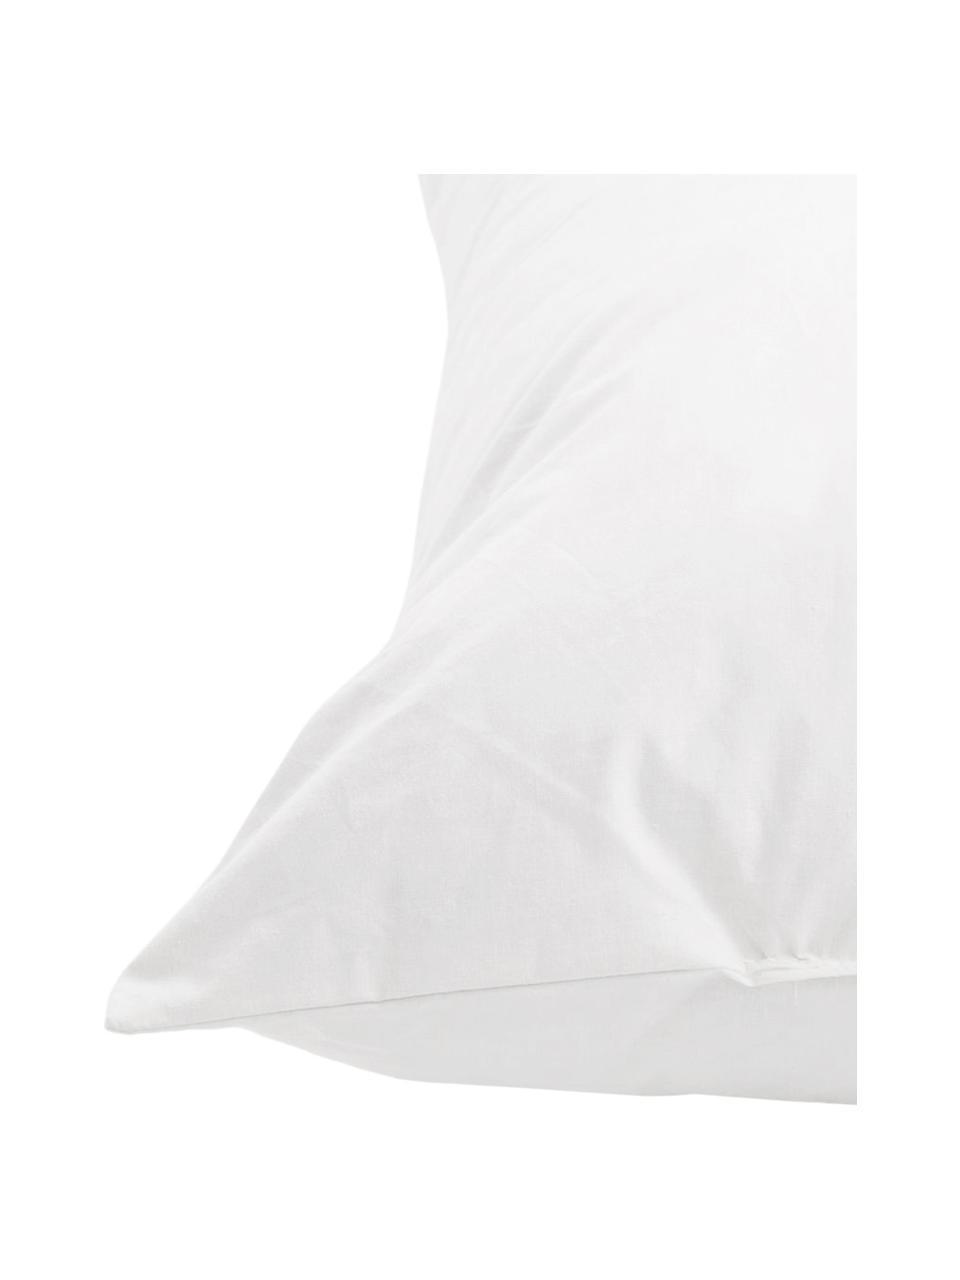 Kissen-Inlett Comfort, 60x60, Feder-Füllung, Bezug: Feinköper, 100% Baumwolle, Weiß, 60 x 60 cm